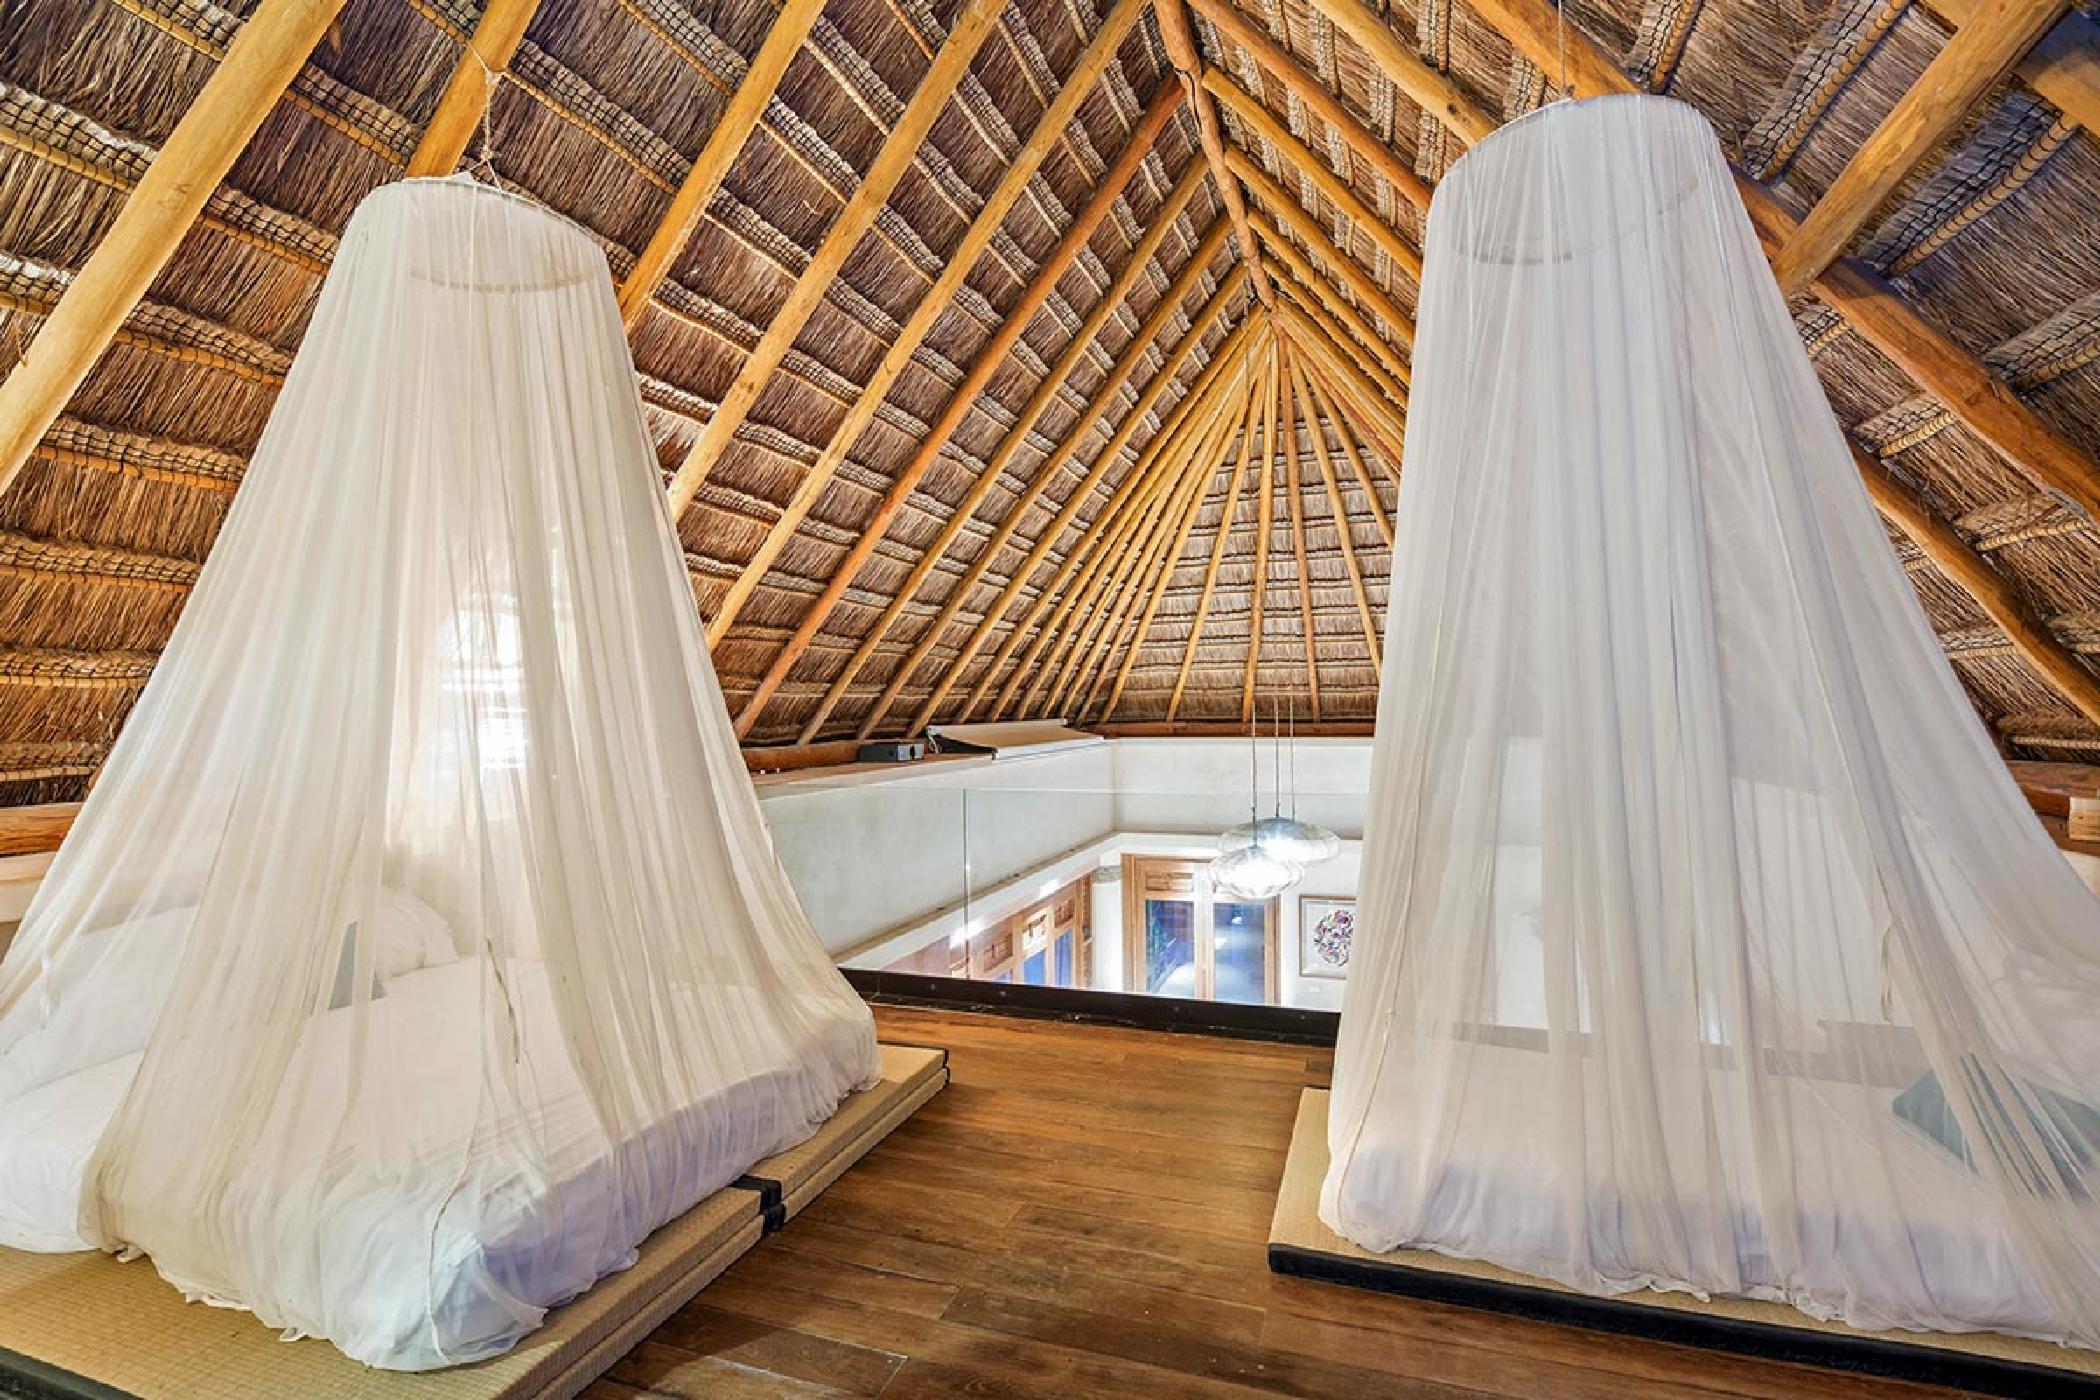 Maya_Luxe_Riviera_Maya_Luxury_Villas_Experiences_Sian_Kaan_Tulum_4_Bedrooms_Casa_Cantarena_25.jpg